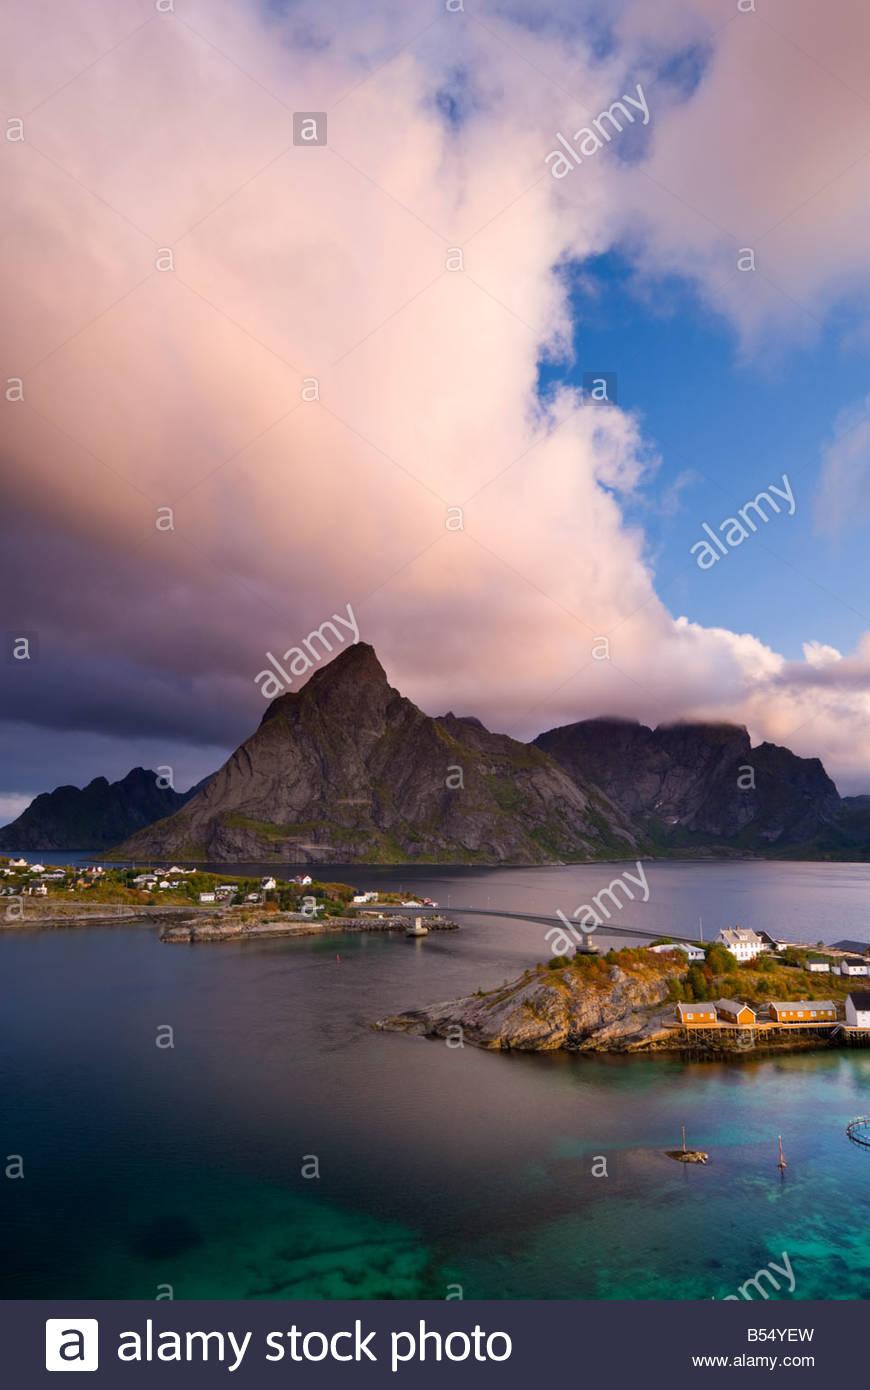 Clouds gather over the peaks above Sakrisøy, near Reine, Lofoten Islands, Norway. - Stock Image